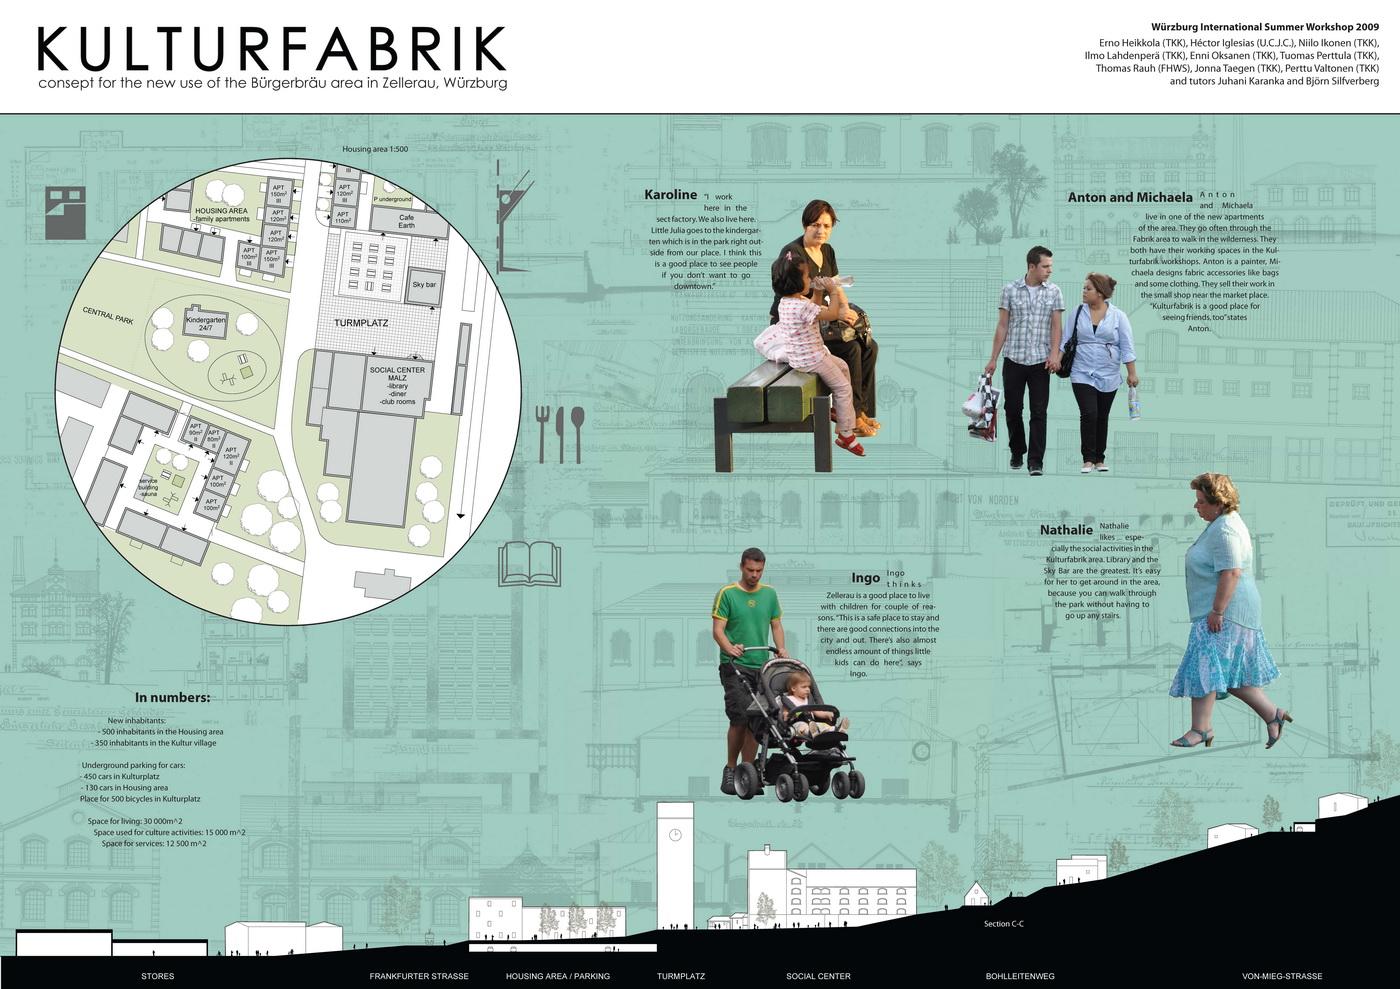 kulturfabrik_3